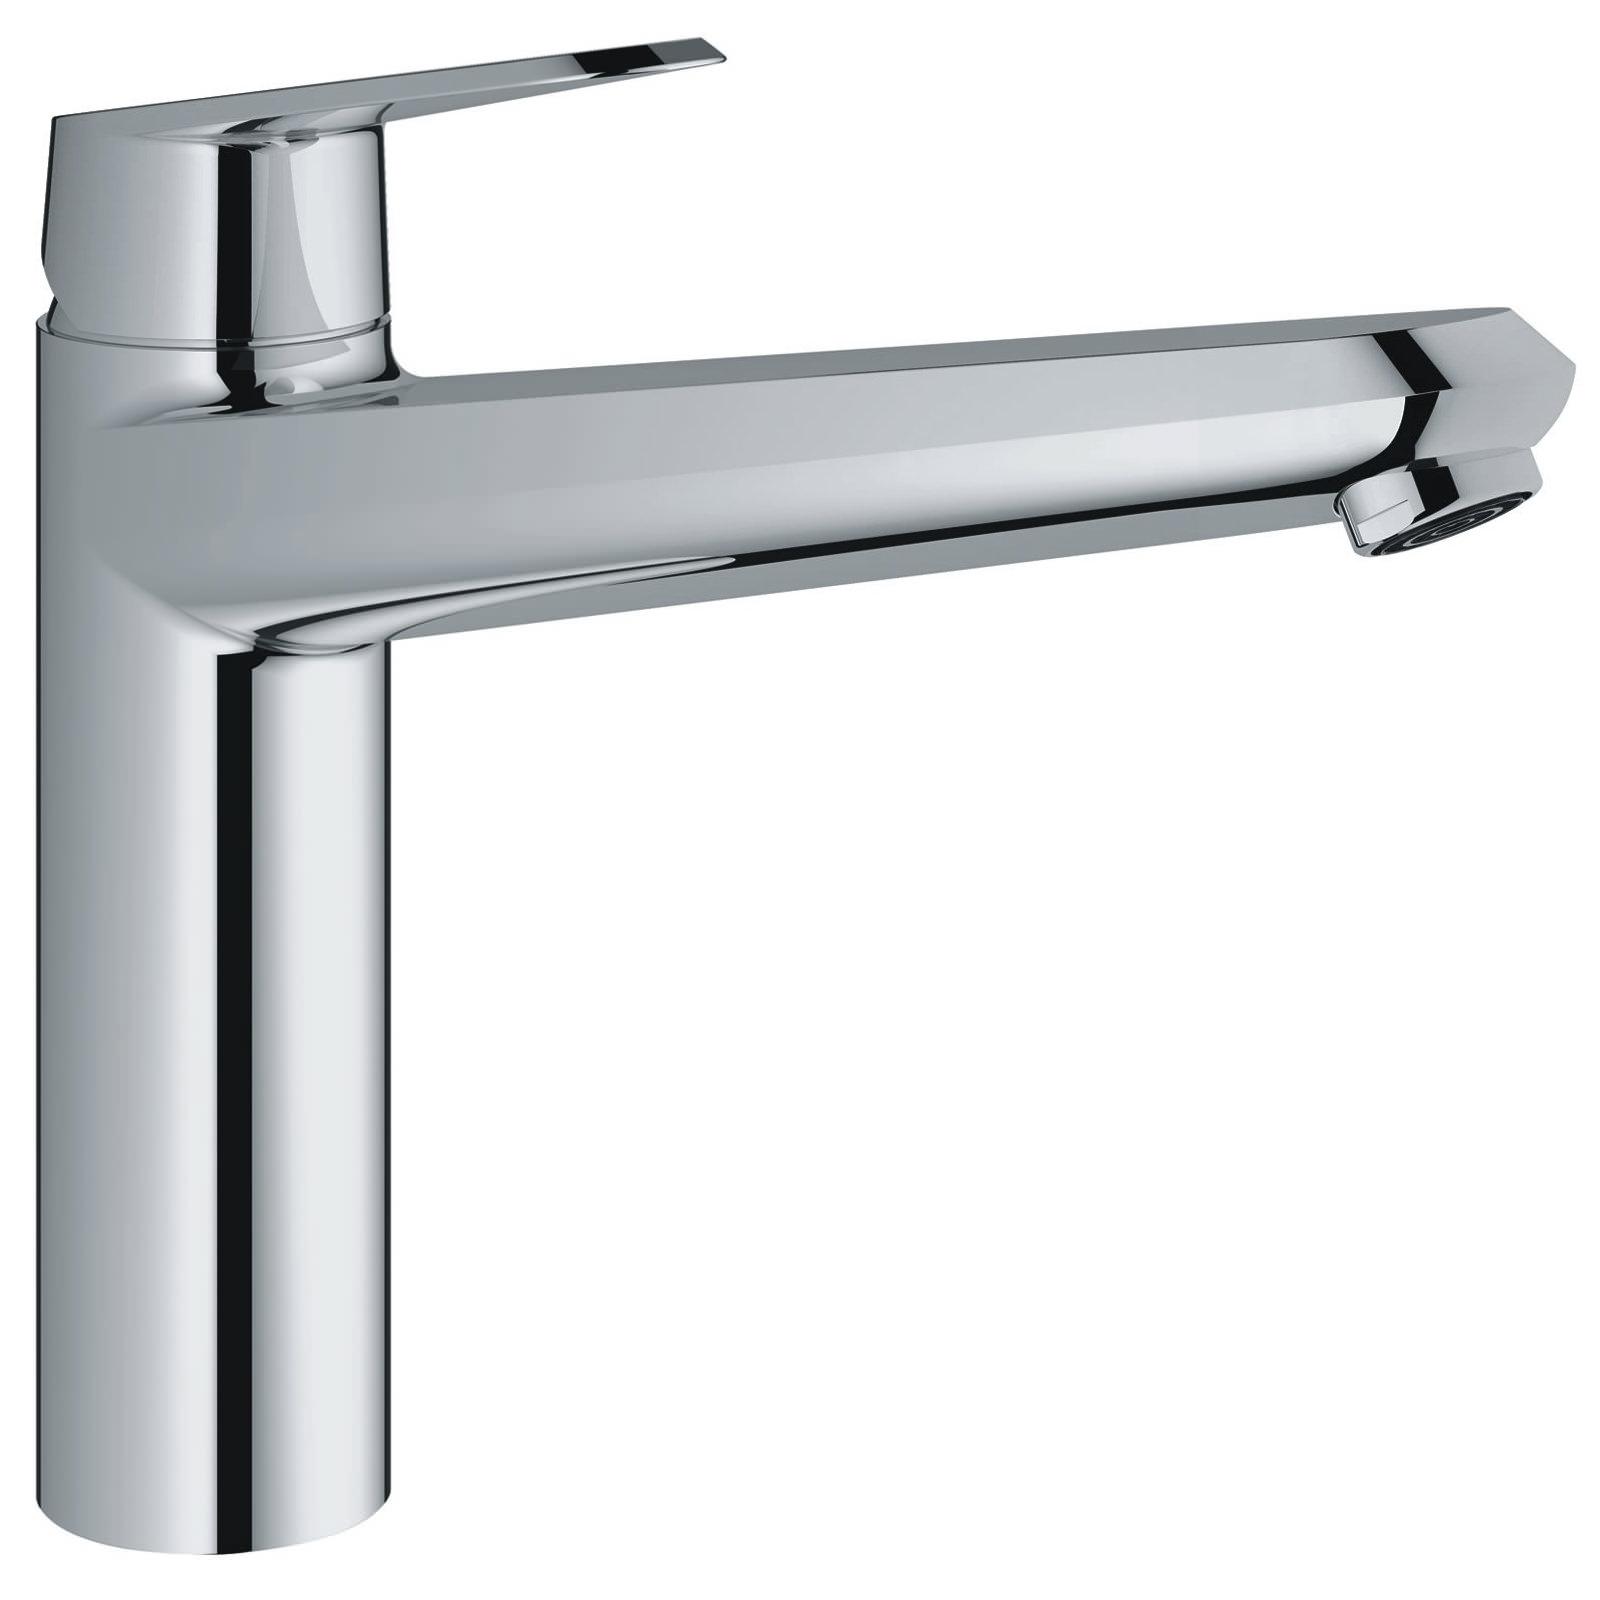 grohe eurodisc cosmopolitan chrome mono sink mixer tap 33770002. Black Bedroom Furniture Sets. Home Design Ideas